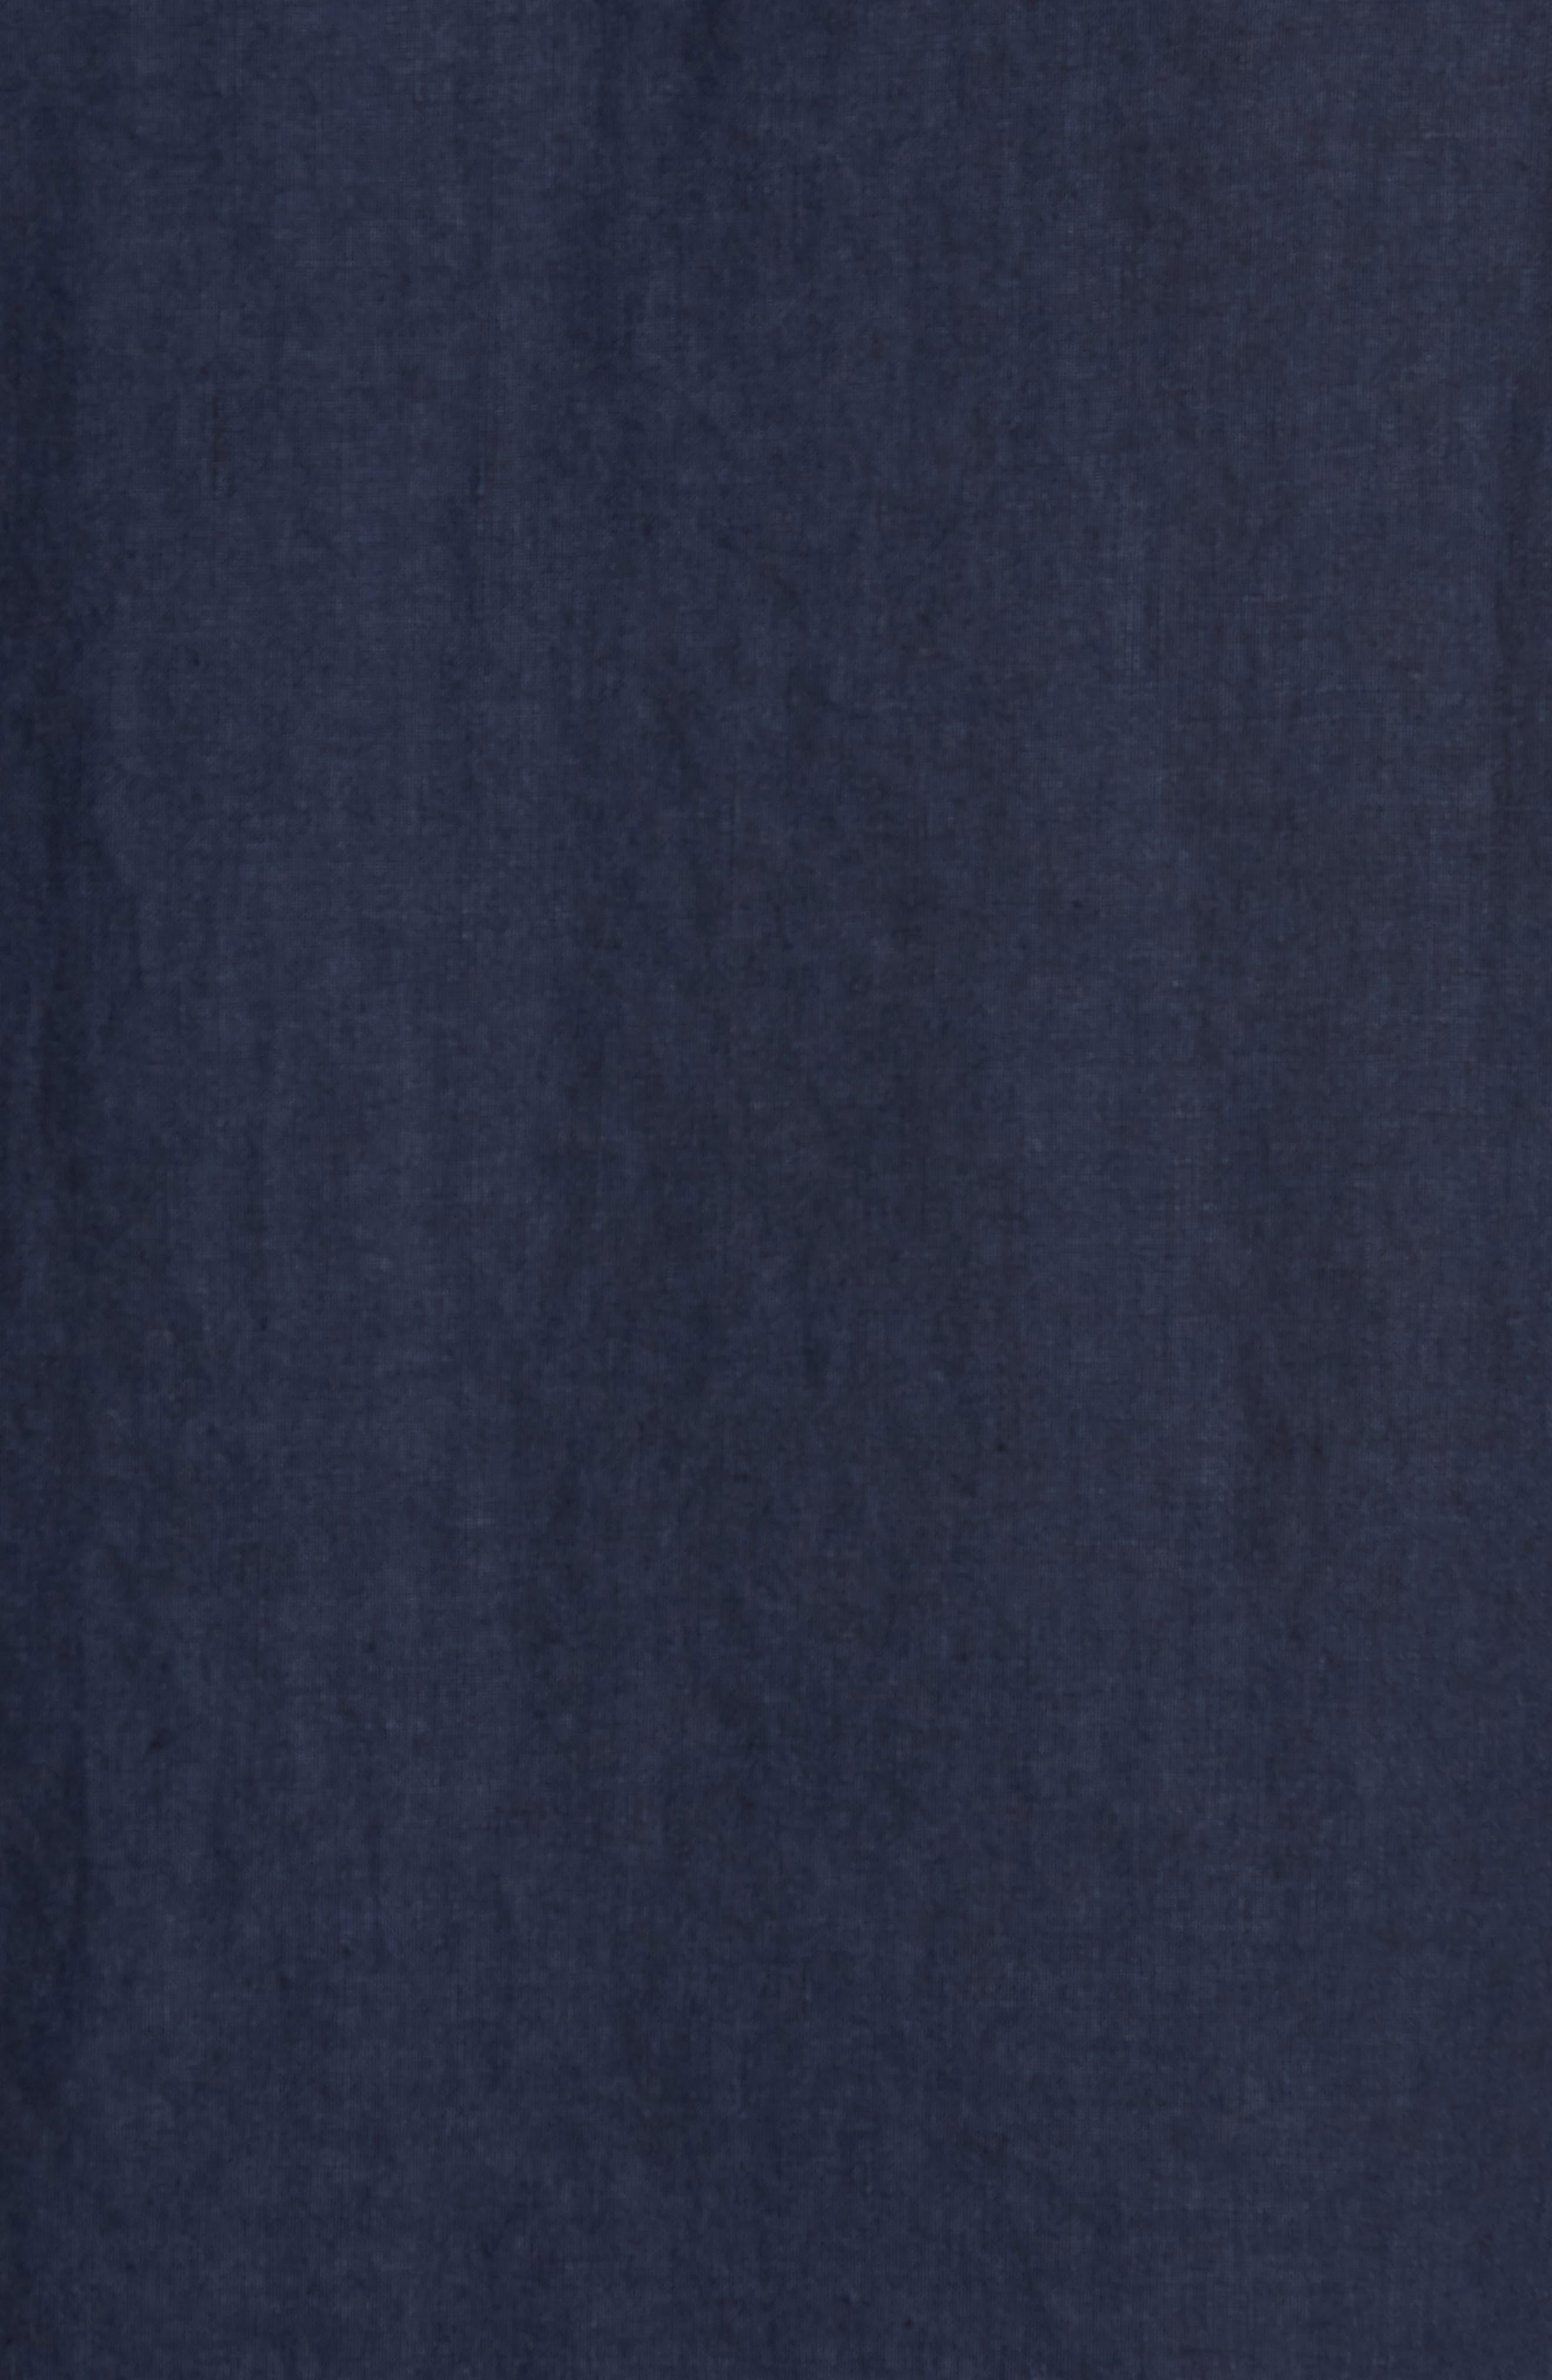 & Bros. Regular Fit Band Collar Linen Shirt,                             Alternate thumbnail 5, color,                             Mood Indigo